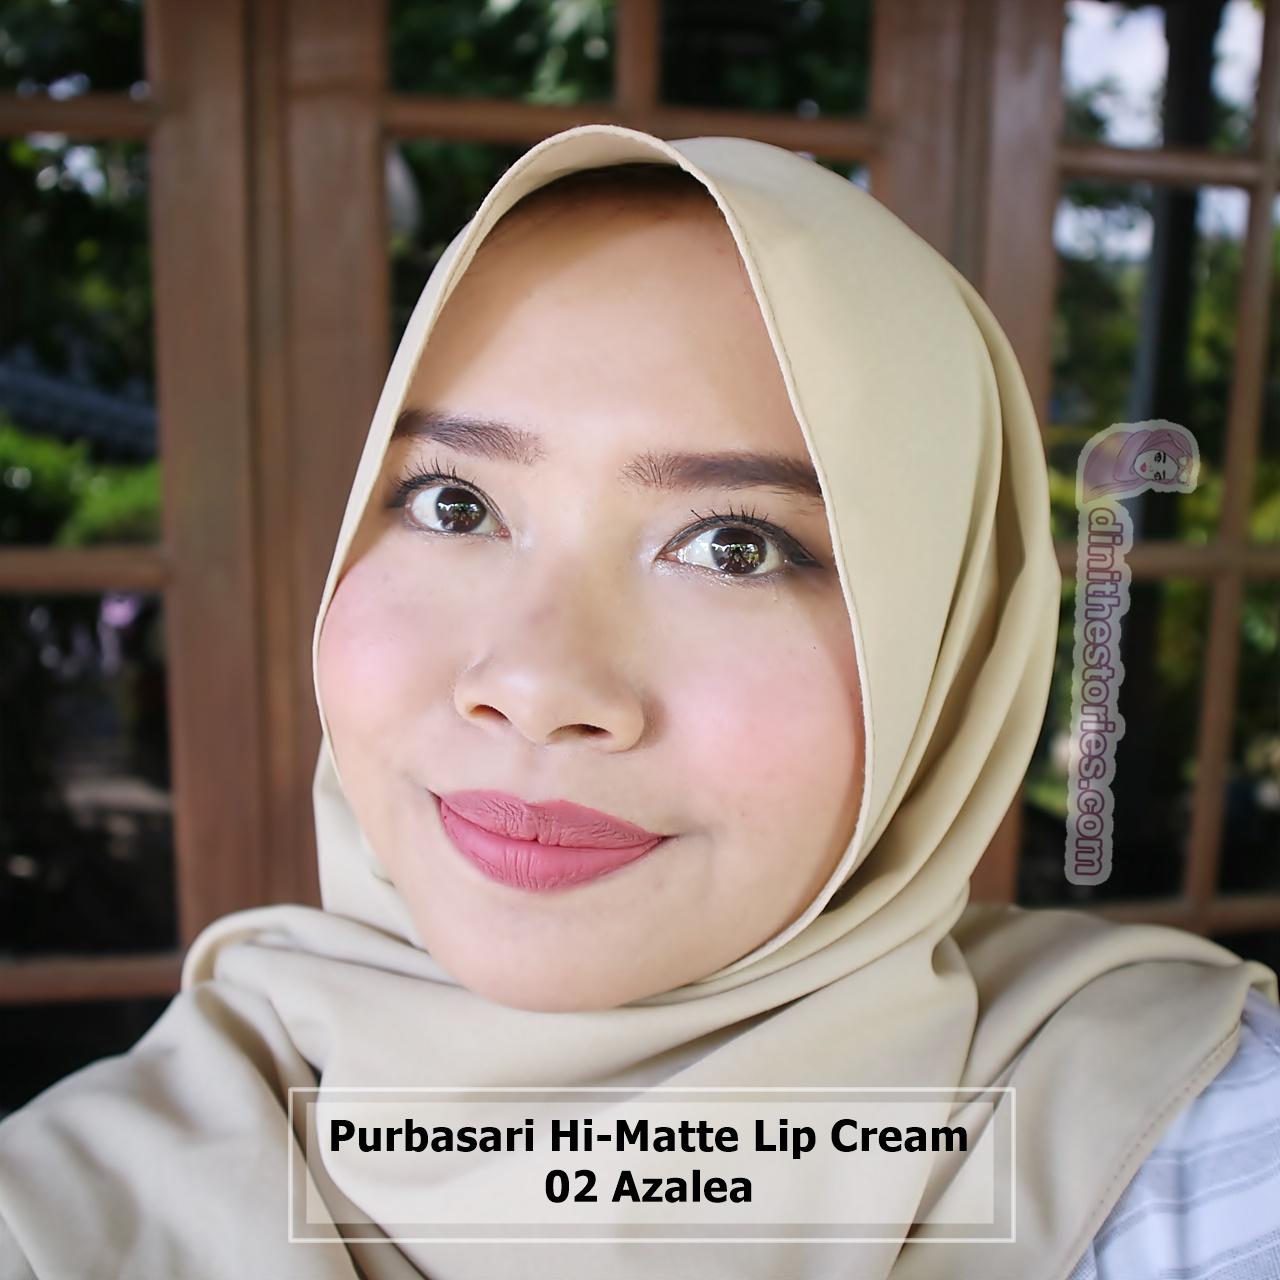 Purbasari Hi Matte Lip Cream Review And Swatch All Shades Dini The 02 Azalea